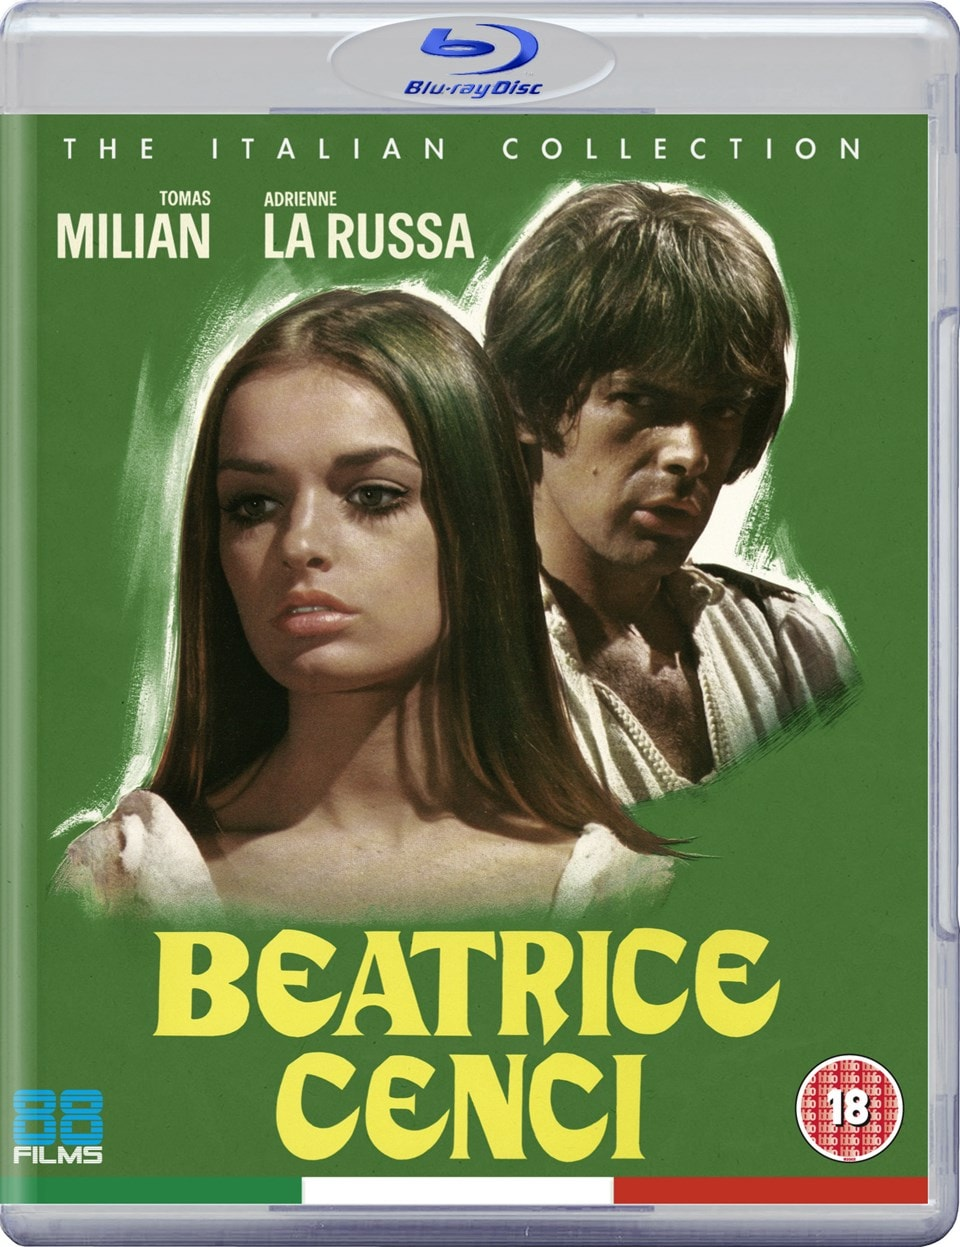 Beatrice Cenci - 1